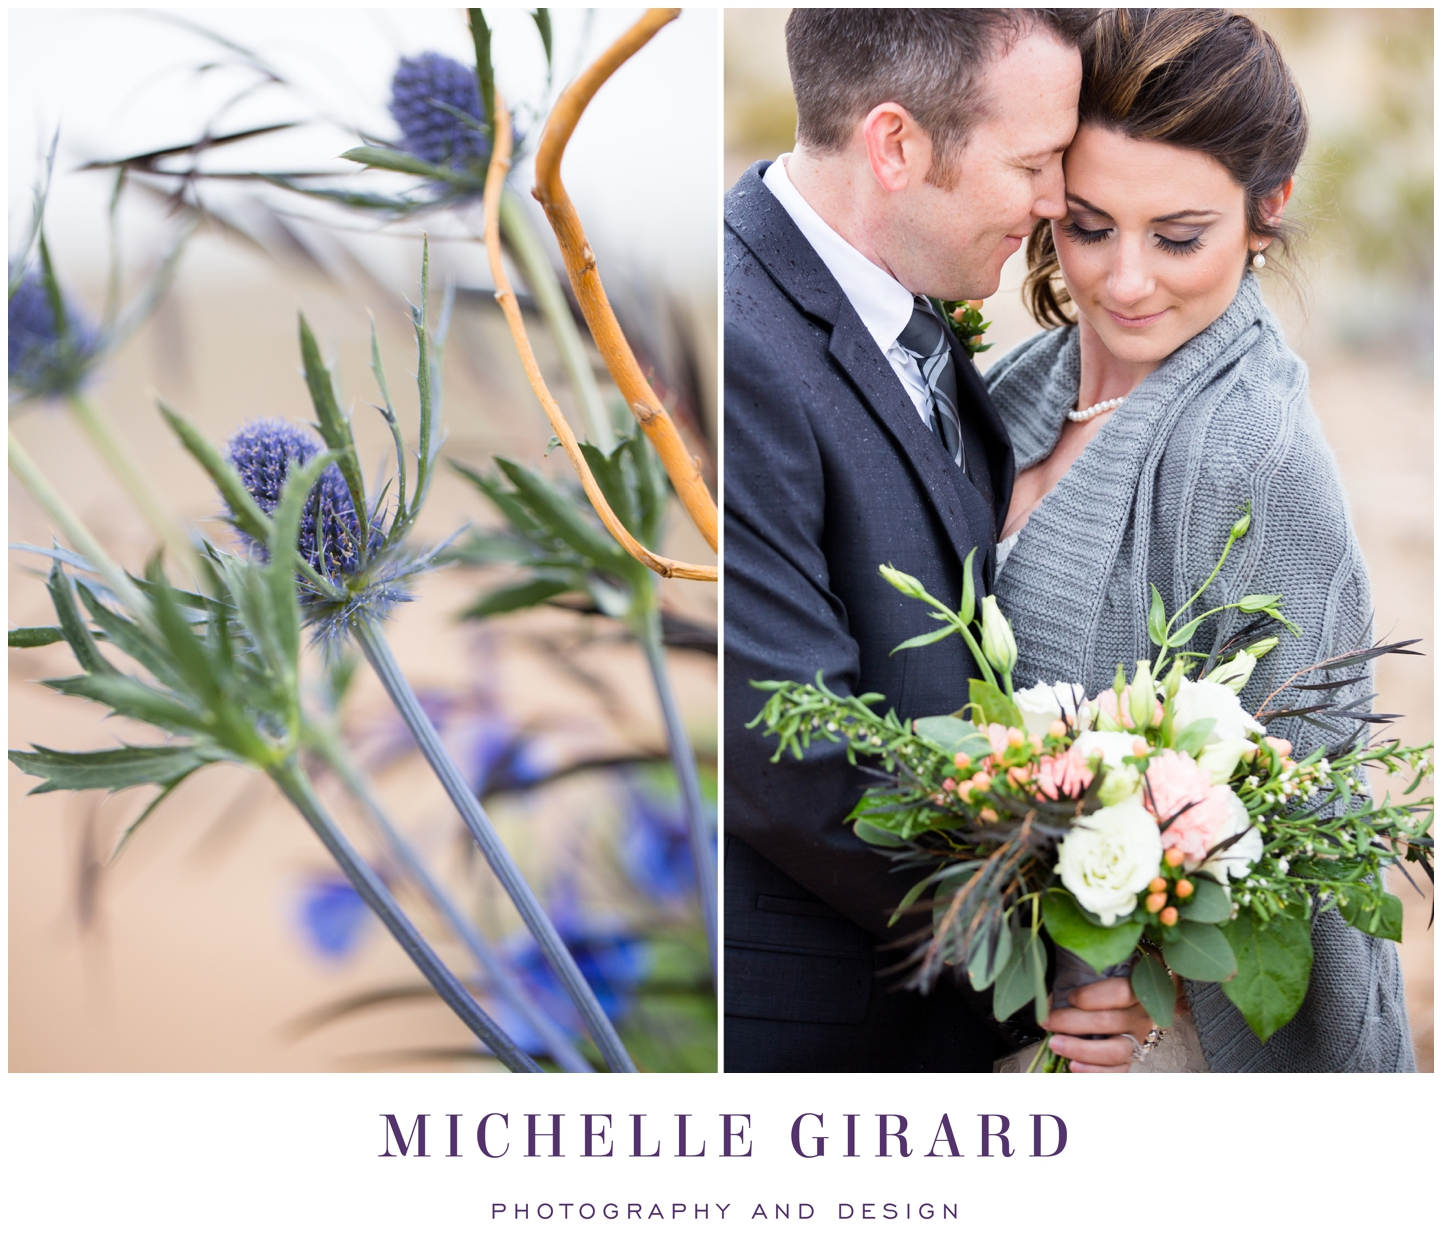 las-vegas-desert-wedding-bride-groom-photography-nevada-michelle-girard-21.jpg